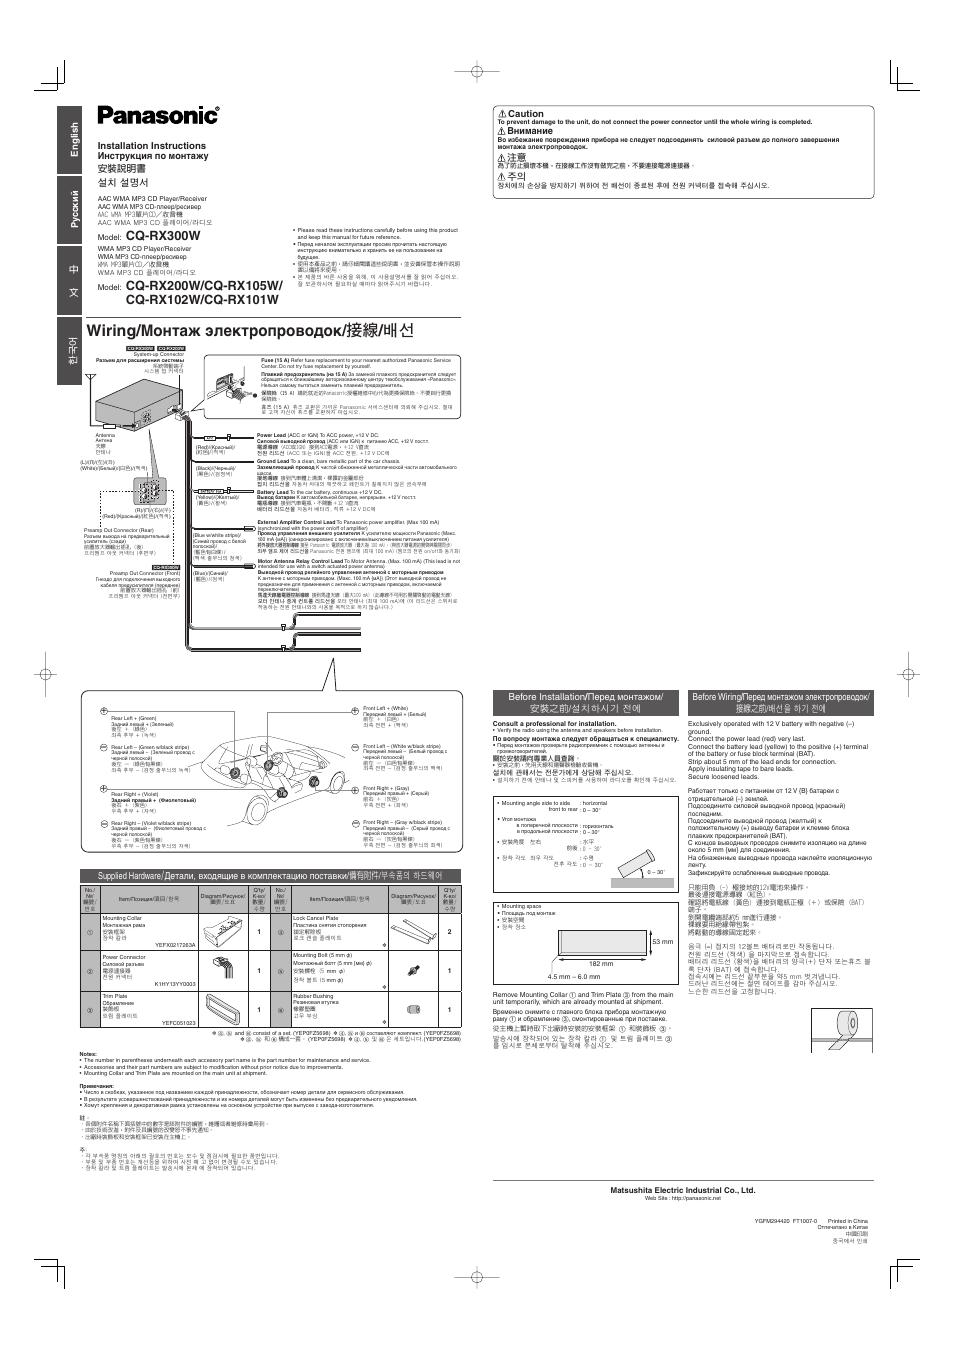 инструкция по эксплуатации panasonic cq rx101w 4 страницы также для cq rx102w cq rx105w